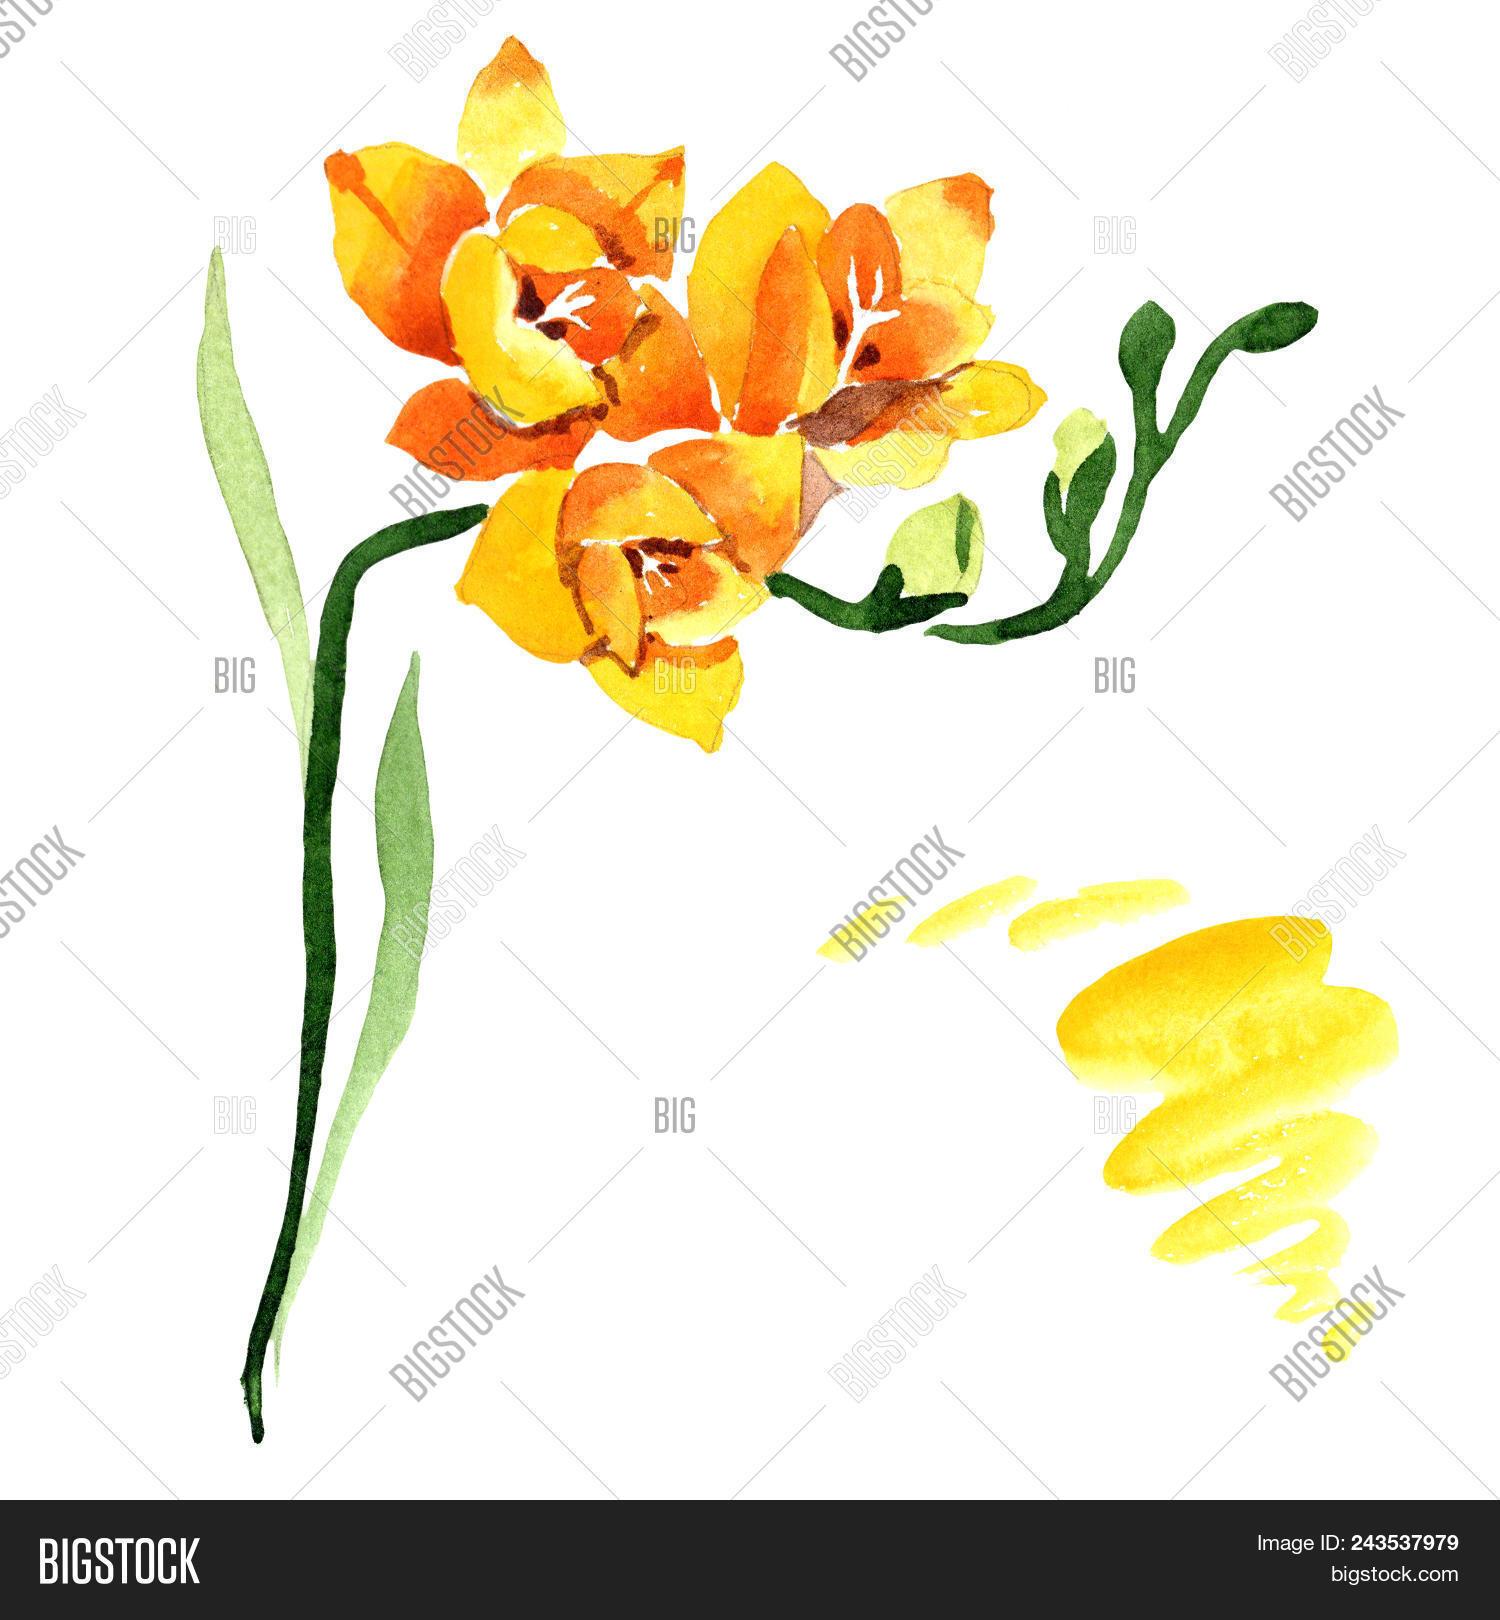 Yellow Freesia Floral Image Photo Free Trial Bigstock